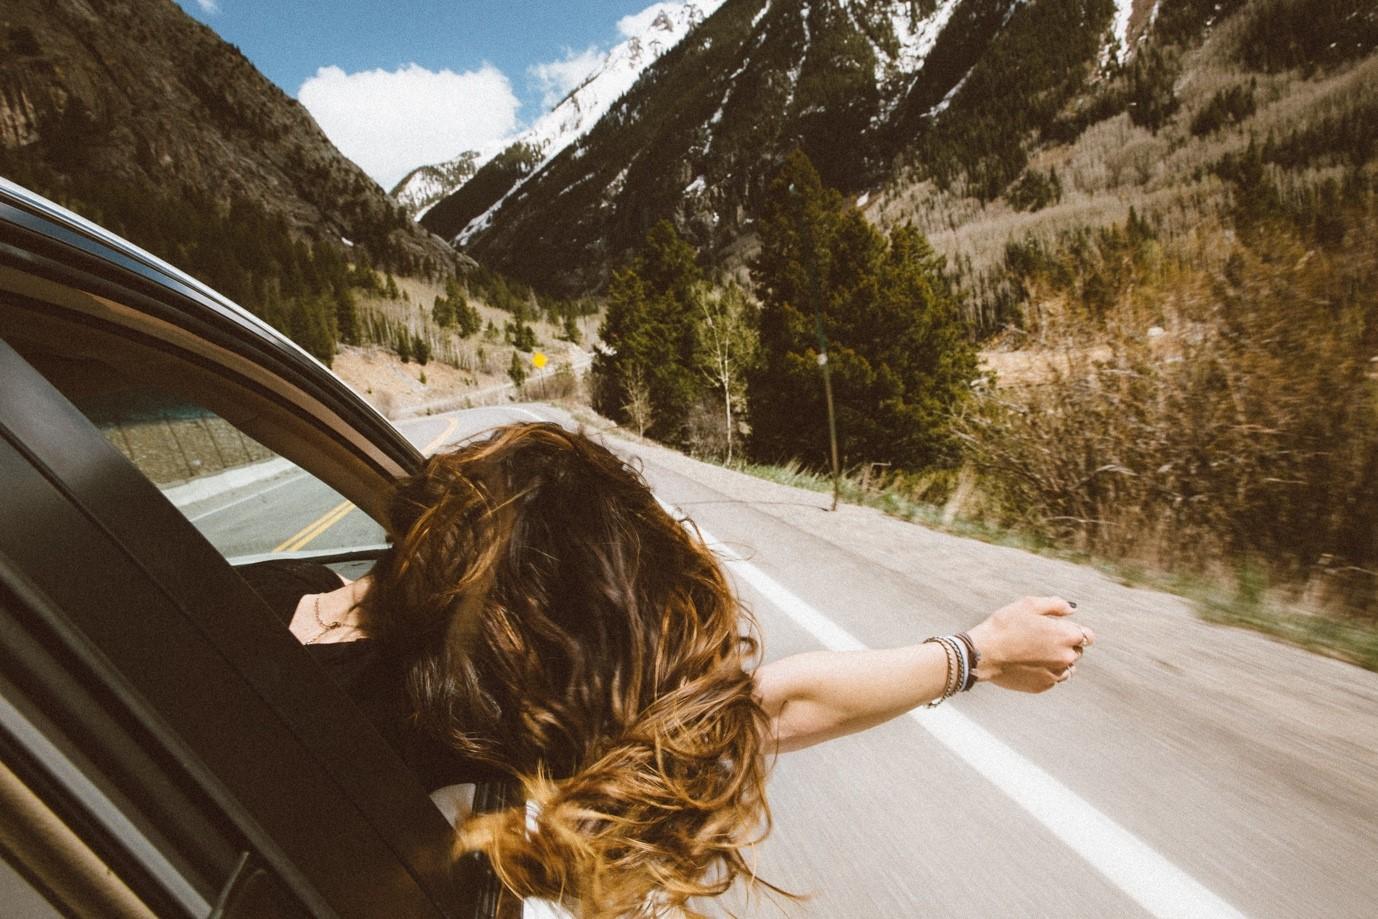 A person enjoying a road trip